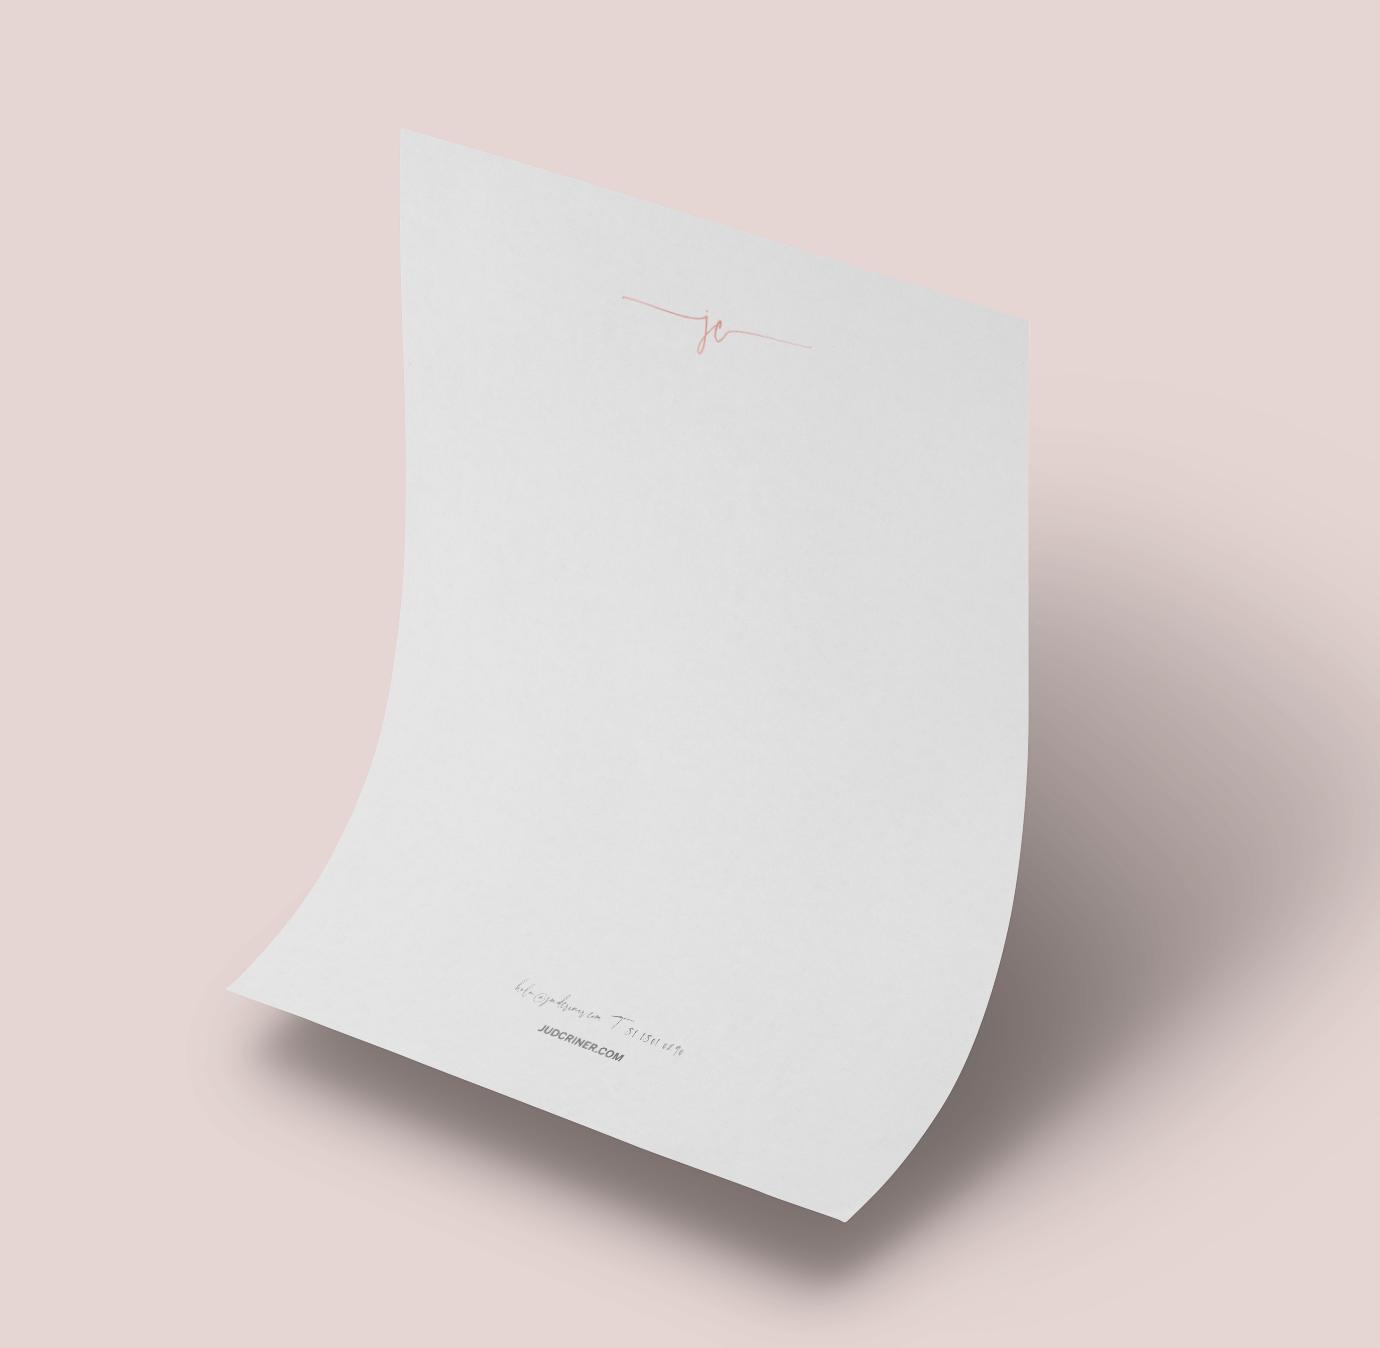 letterhead-jud-criner-yoenpaperland